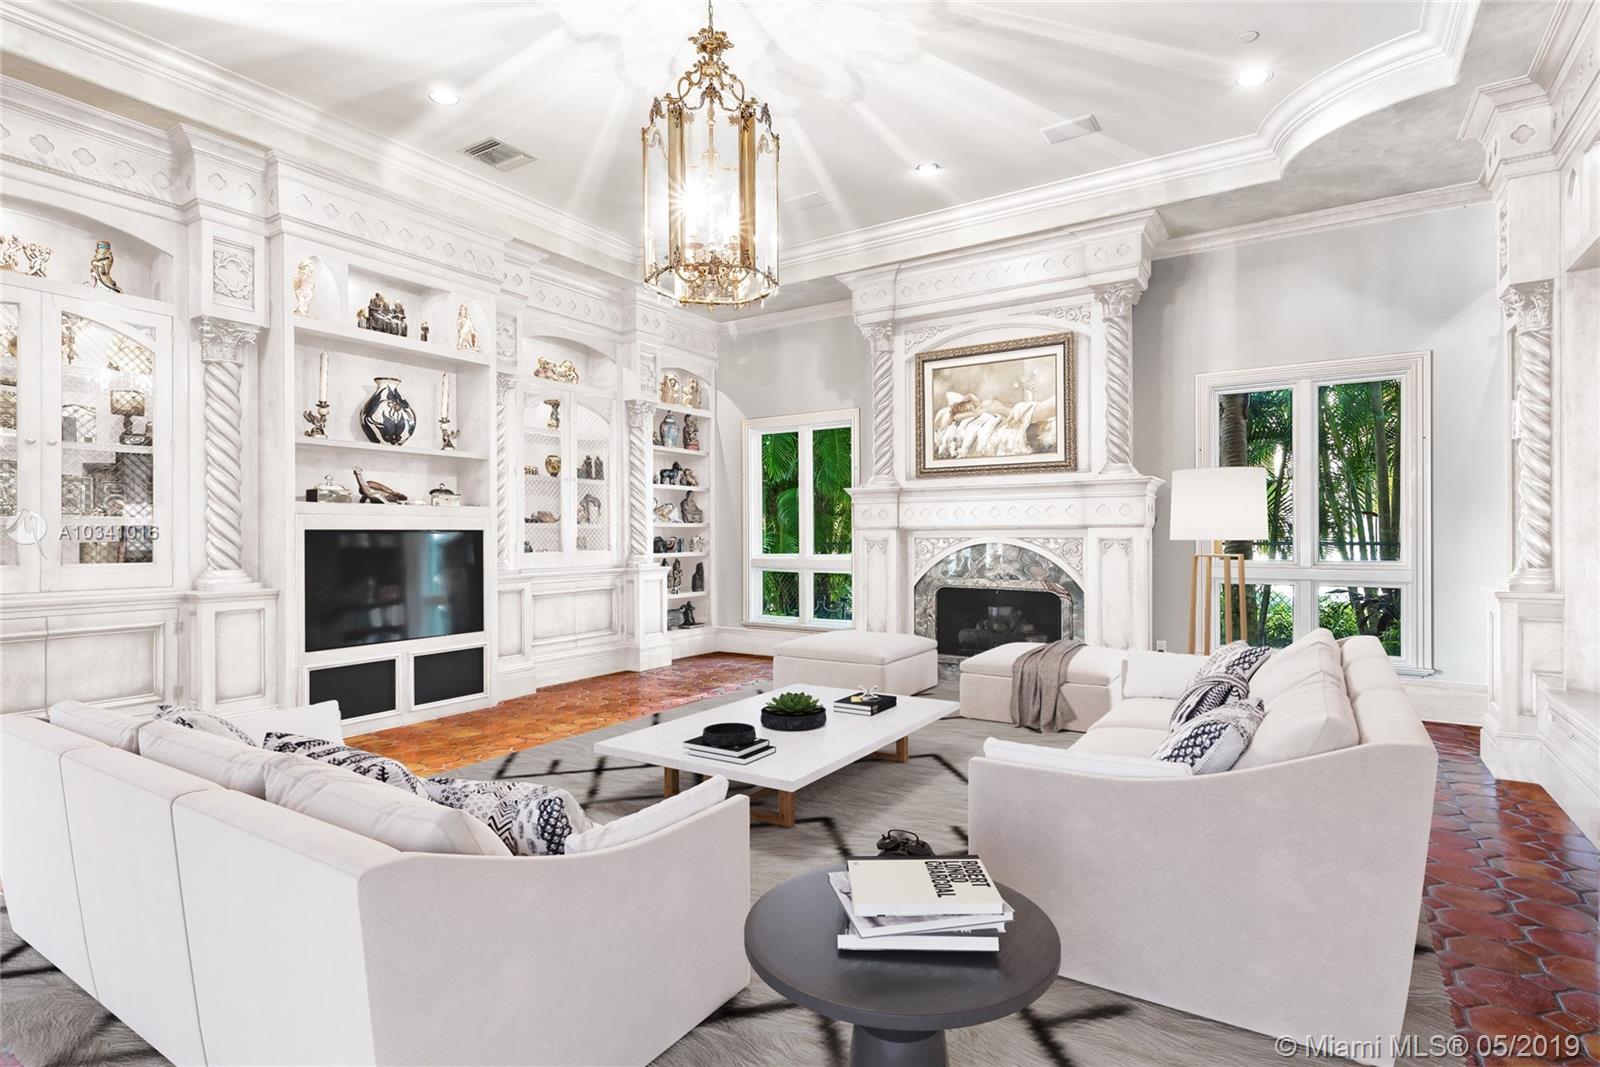 Homes for Sale in Zip Code 33431